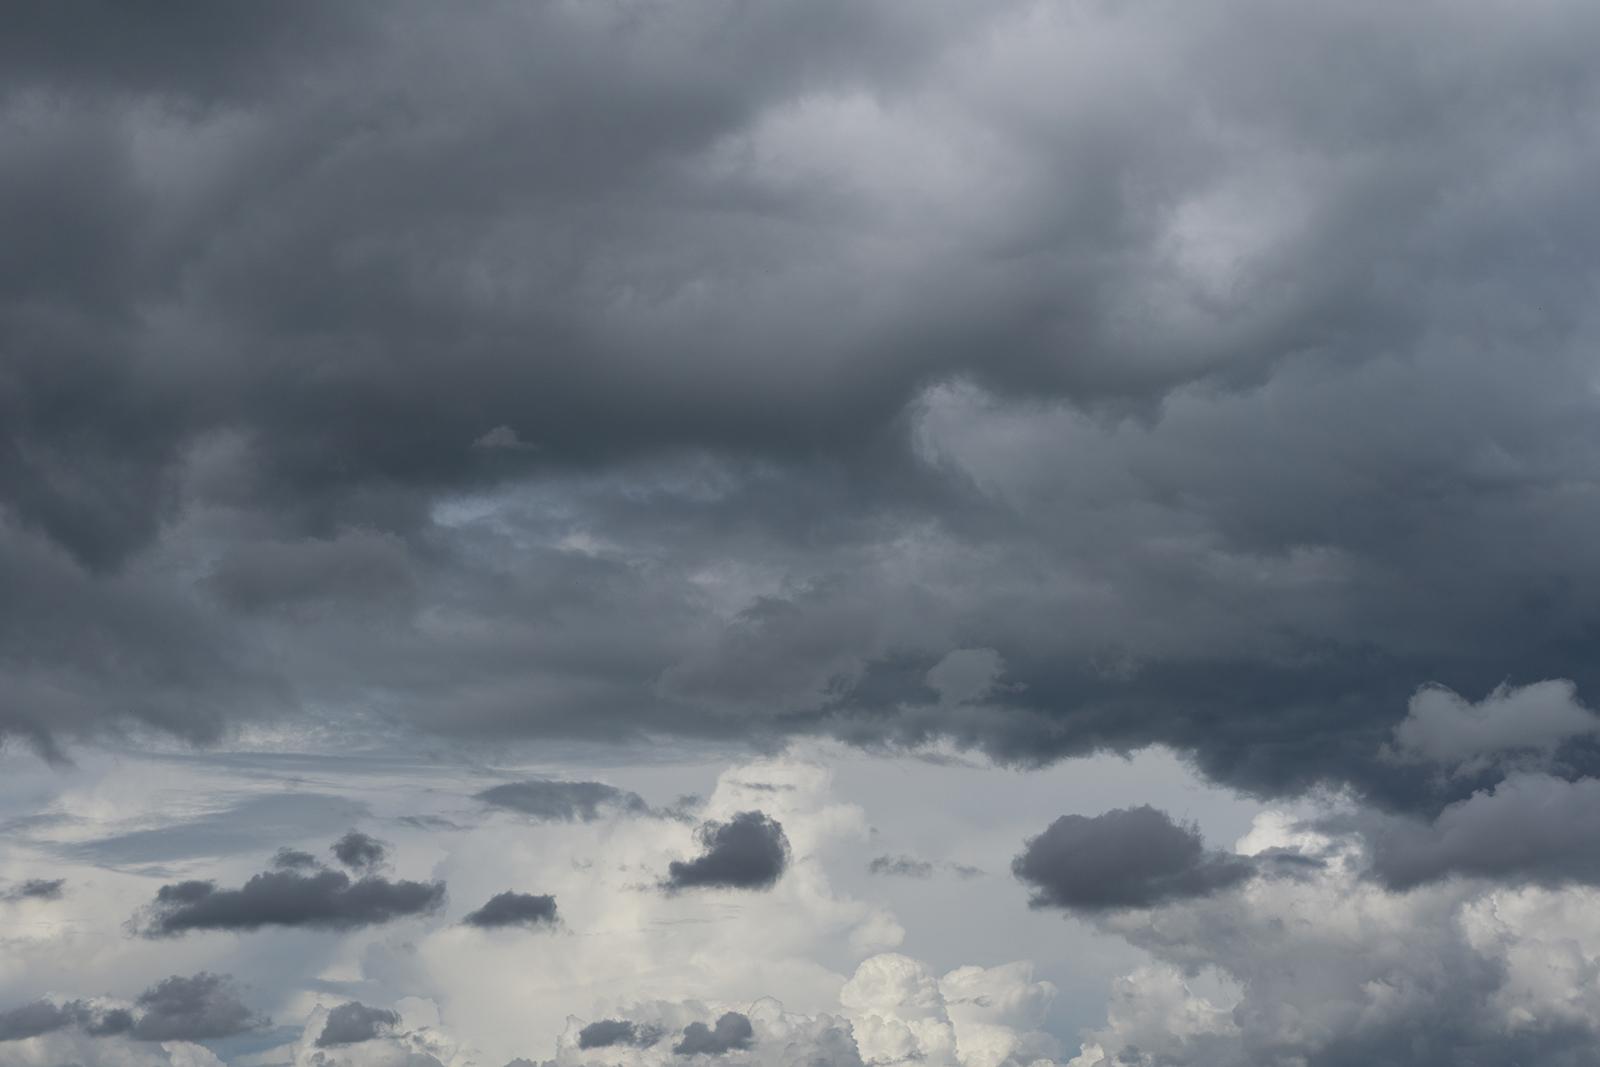 Wolkenbild unbearbeitet